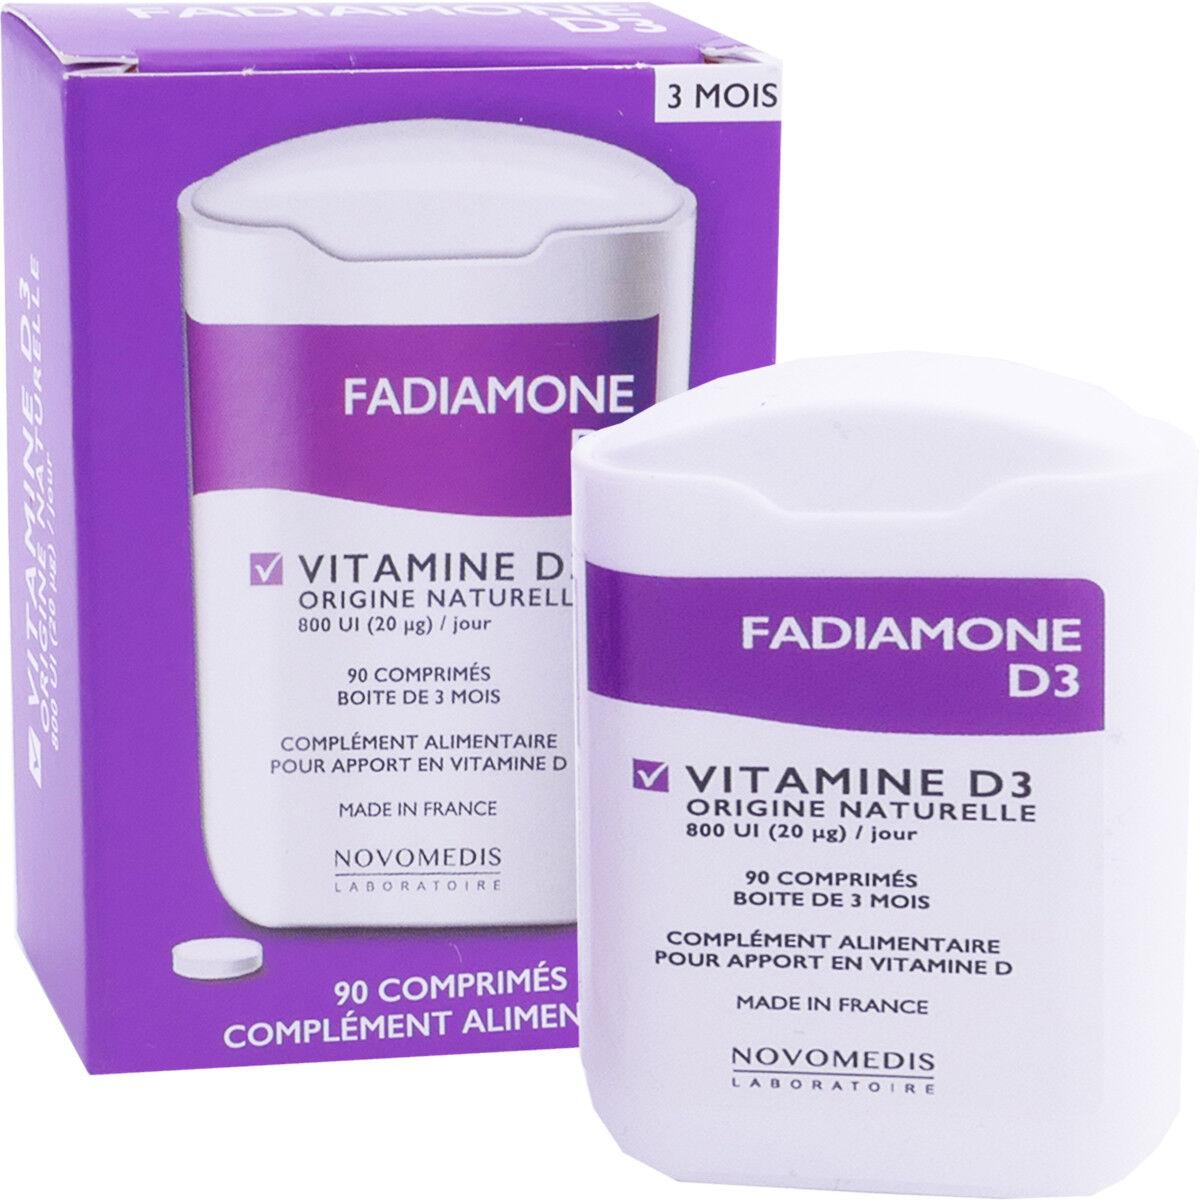 DIVERS Fadiamone d3 vitamine d3 90 comprimes